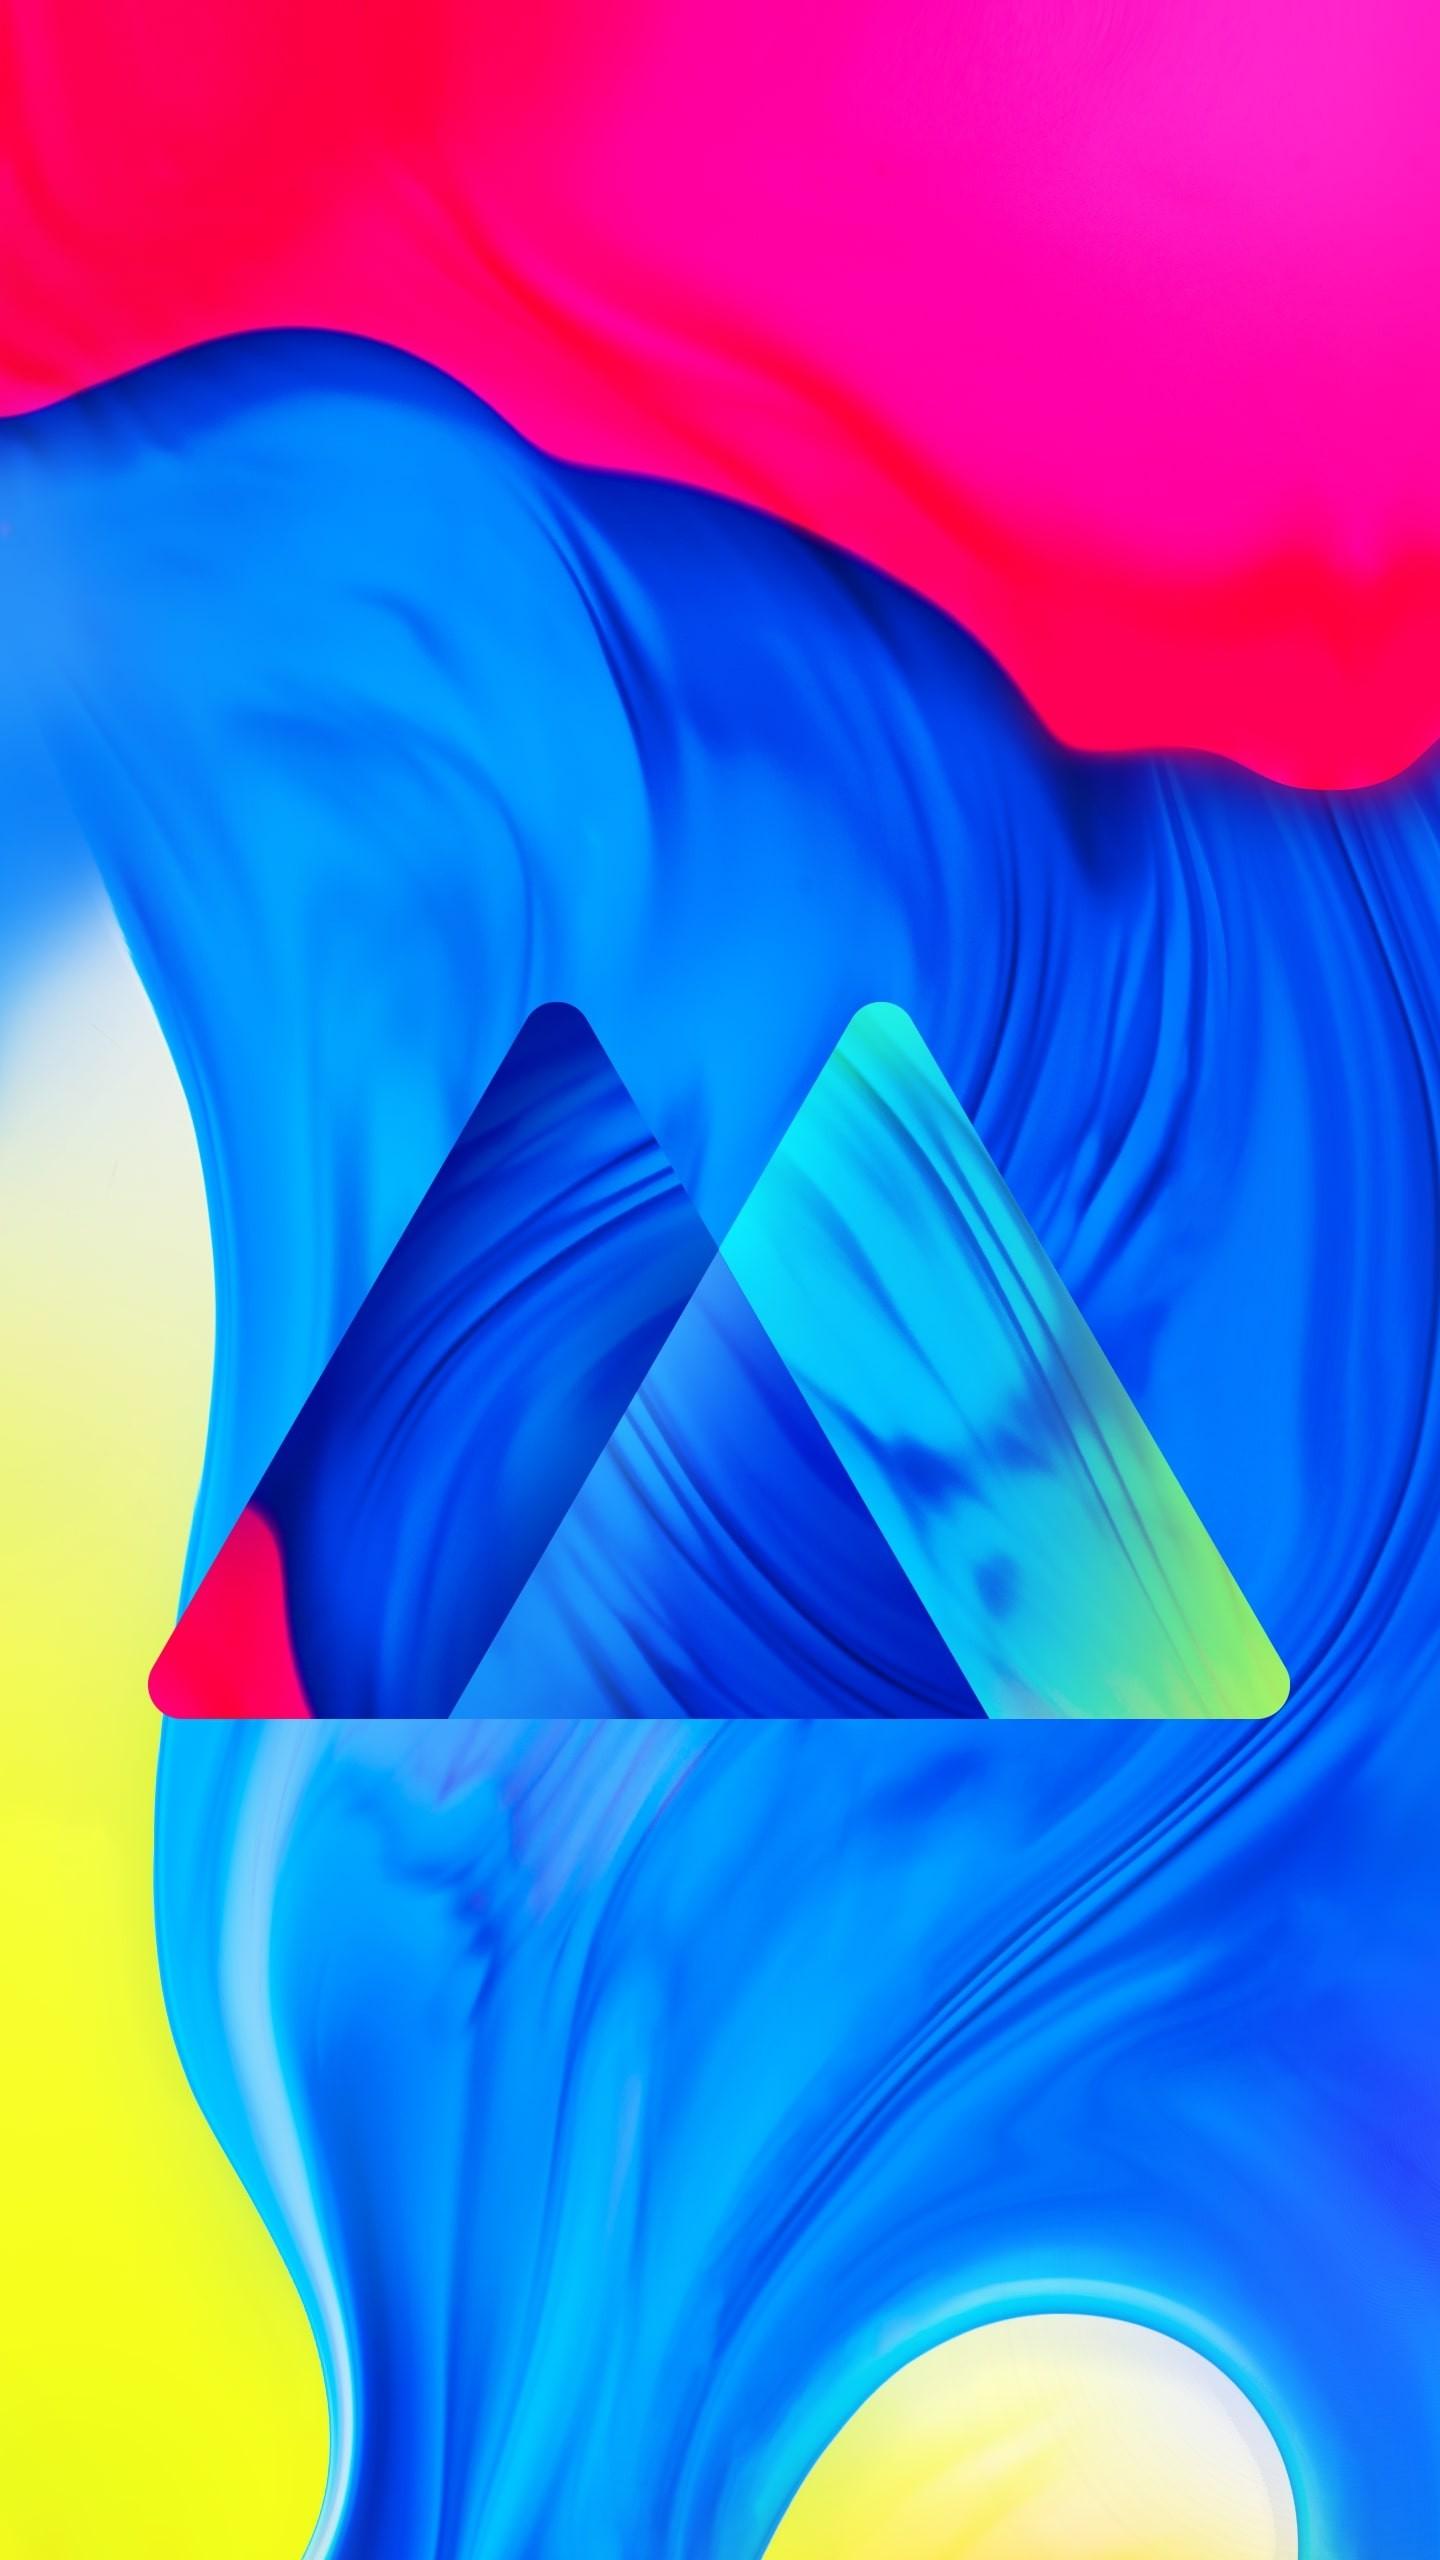 Wallpaper Samsung Galaxy M10 abstract colorful HD OS 21445 1440x2560